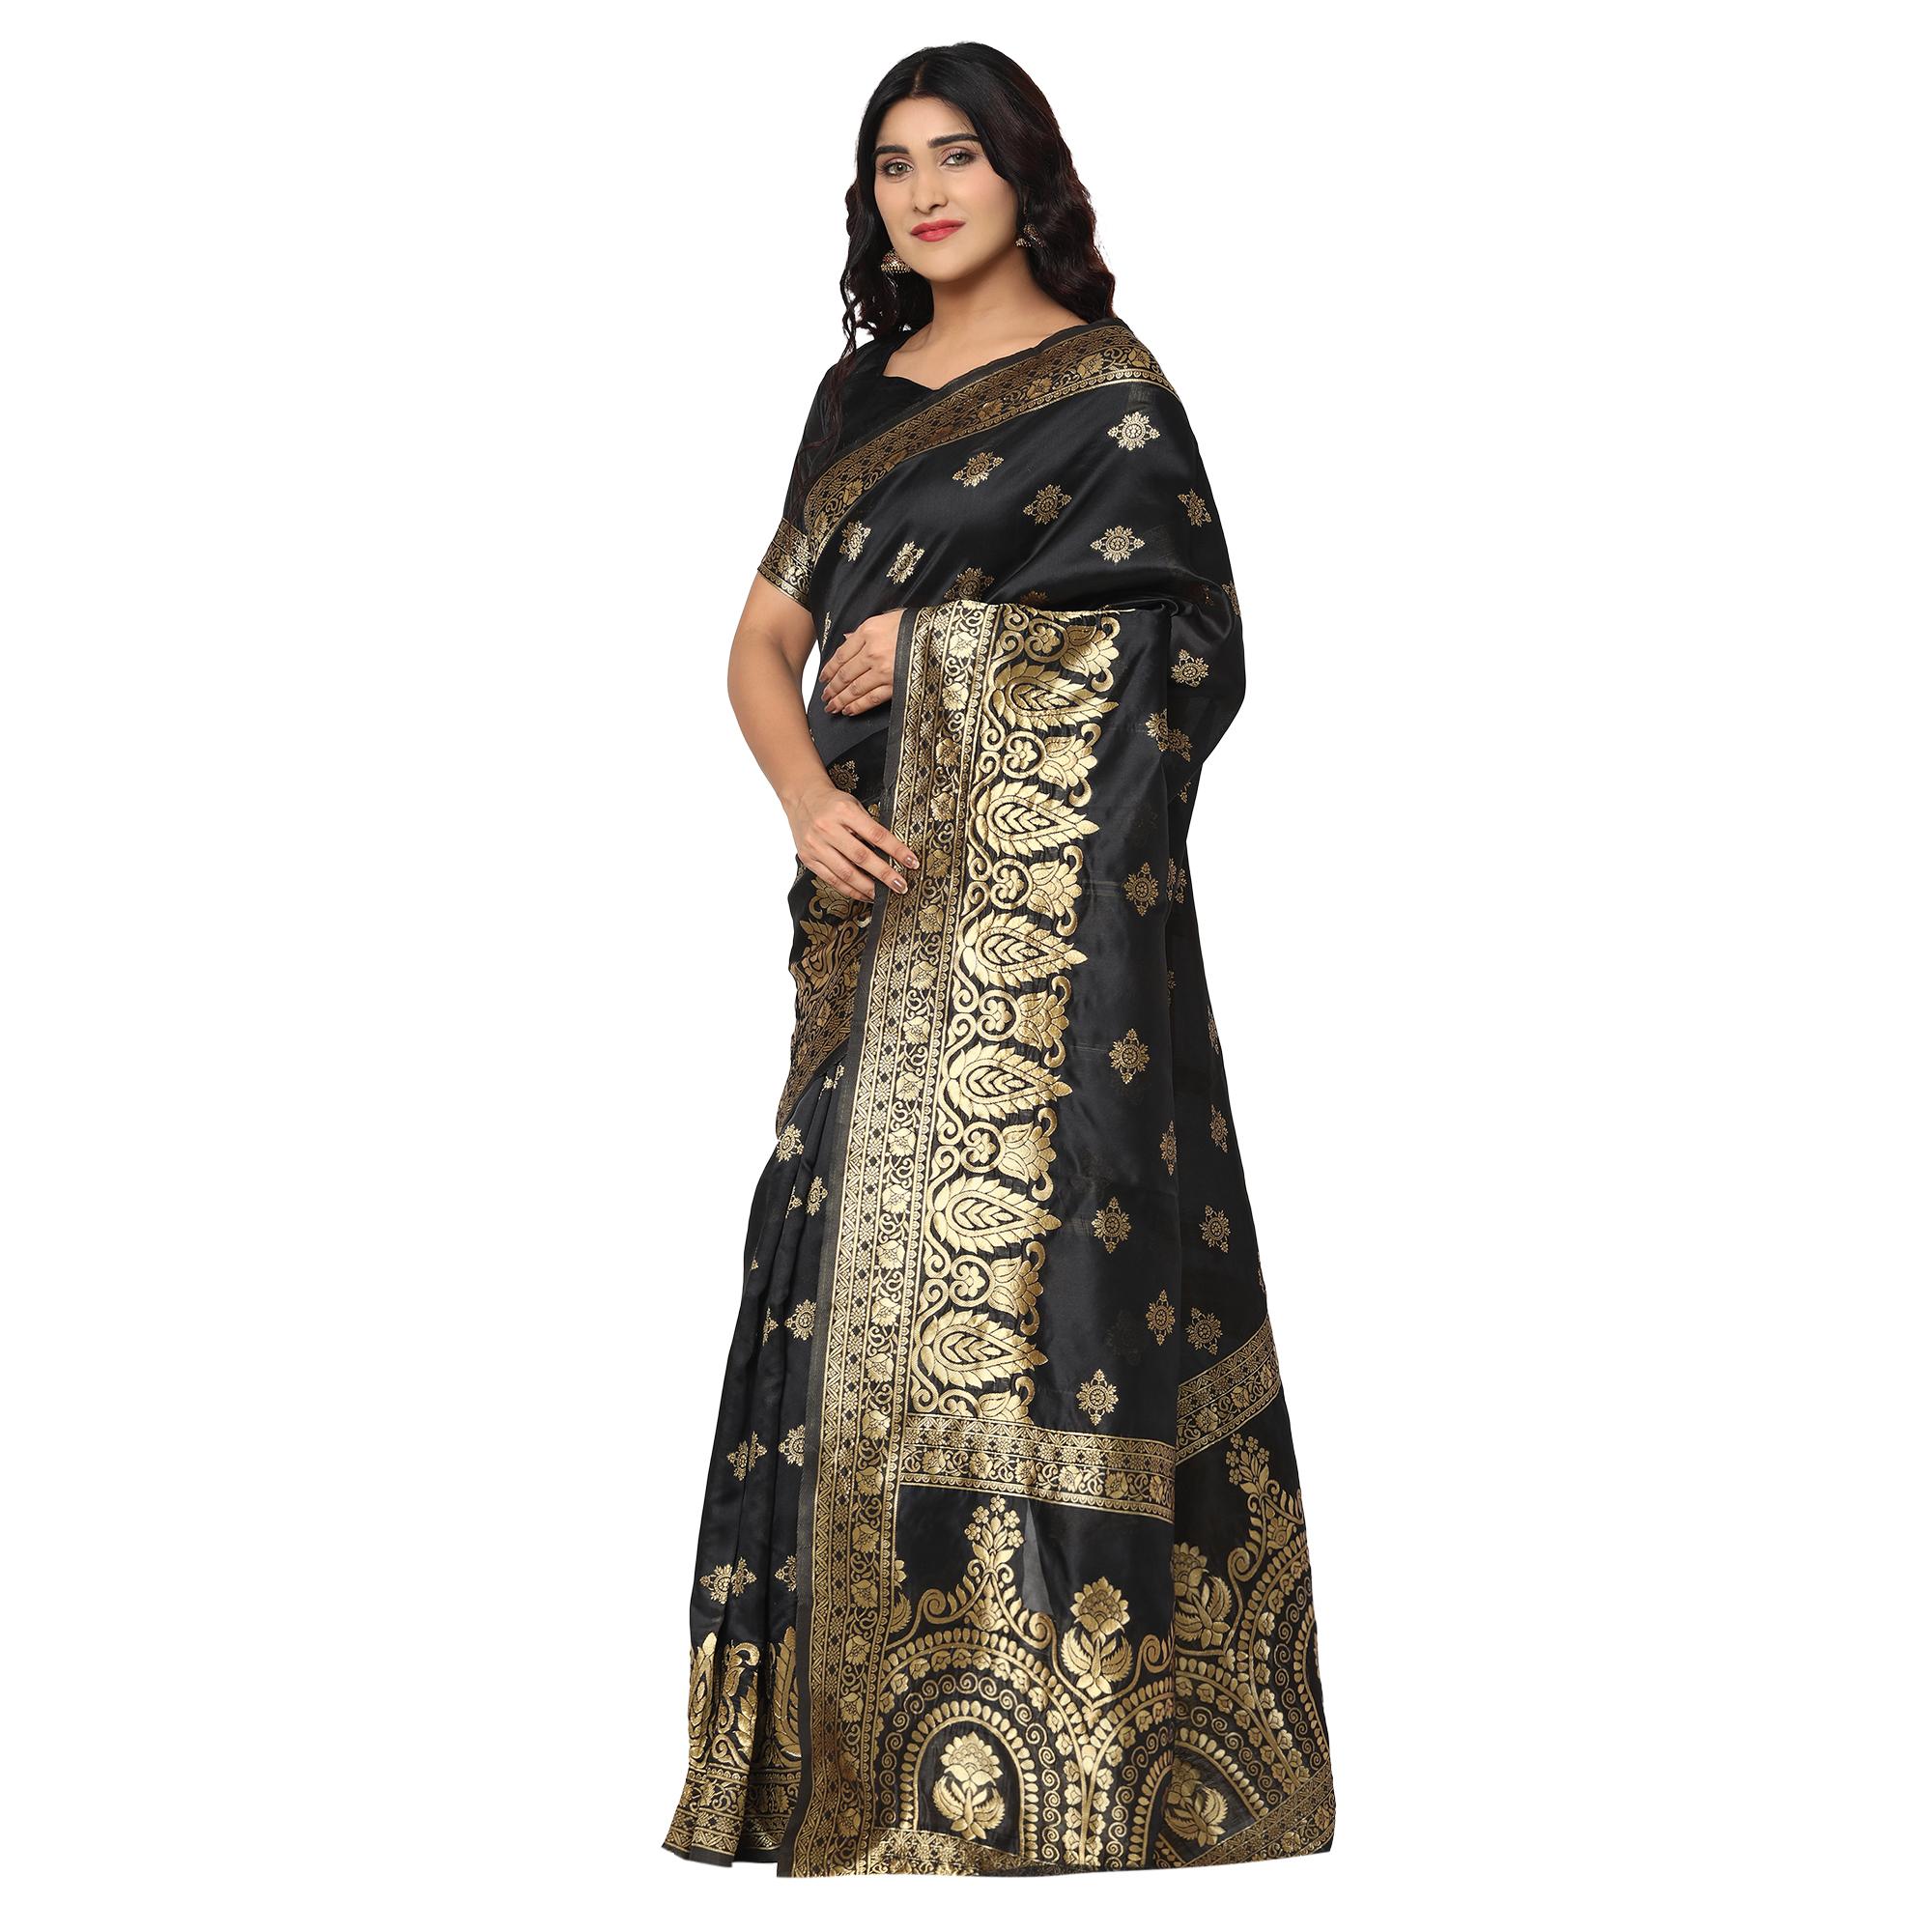 Glemora | Glemora Black Beautiful Ethnic Wear Silk Blend Banarasi Traditional Saree